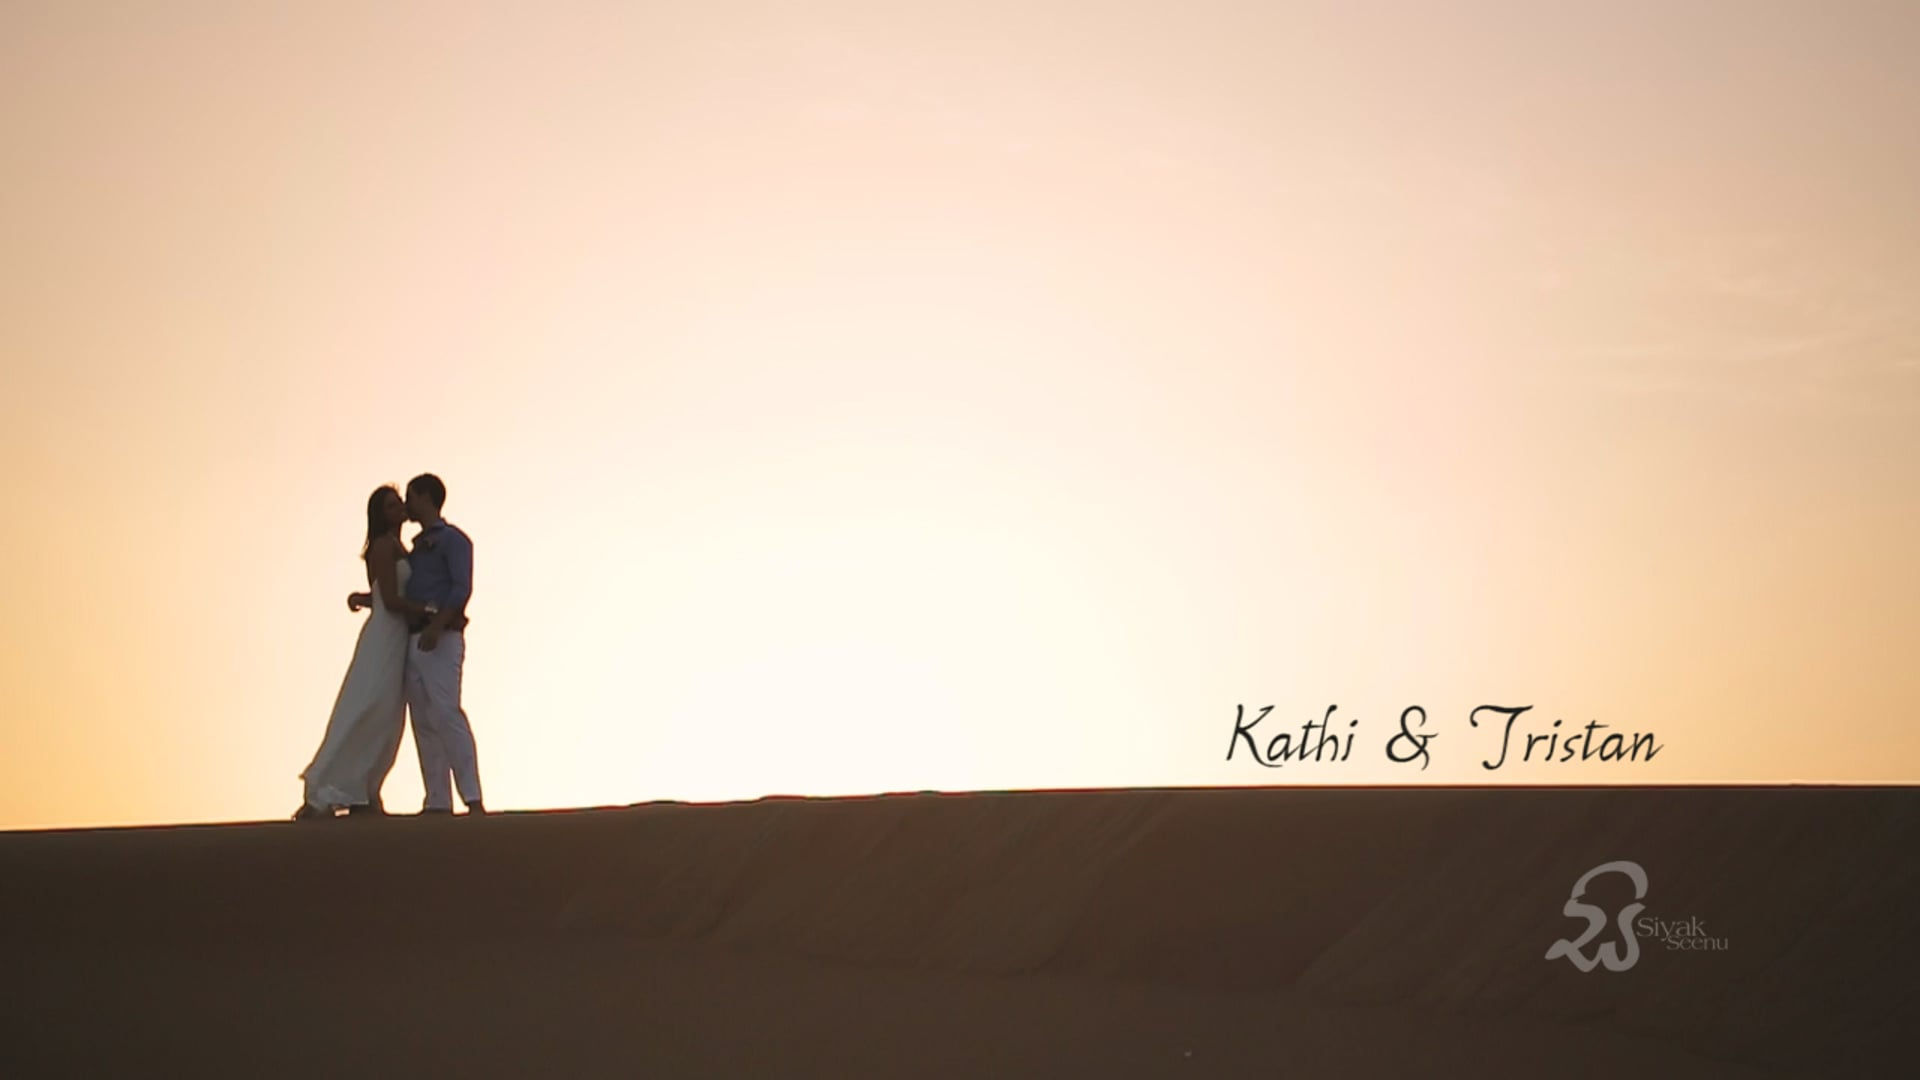 Storyteller: Kathi & Tristan